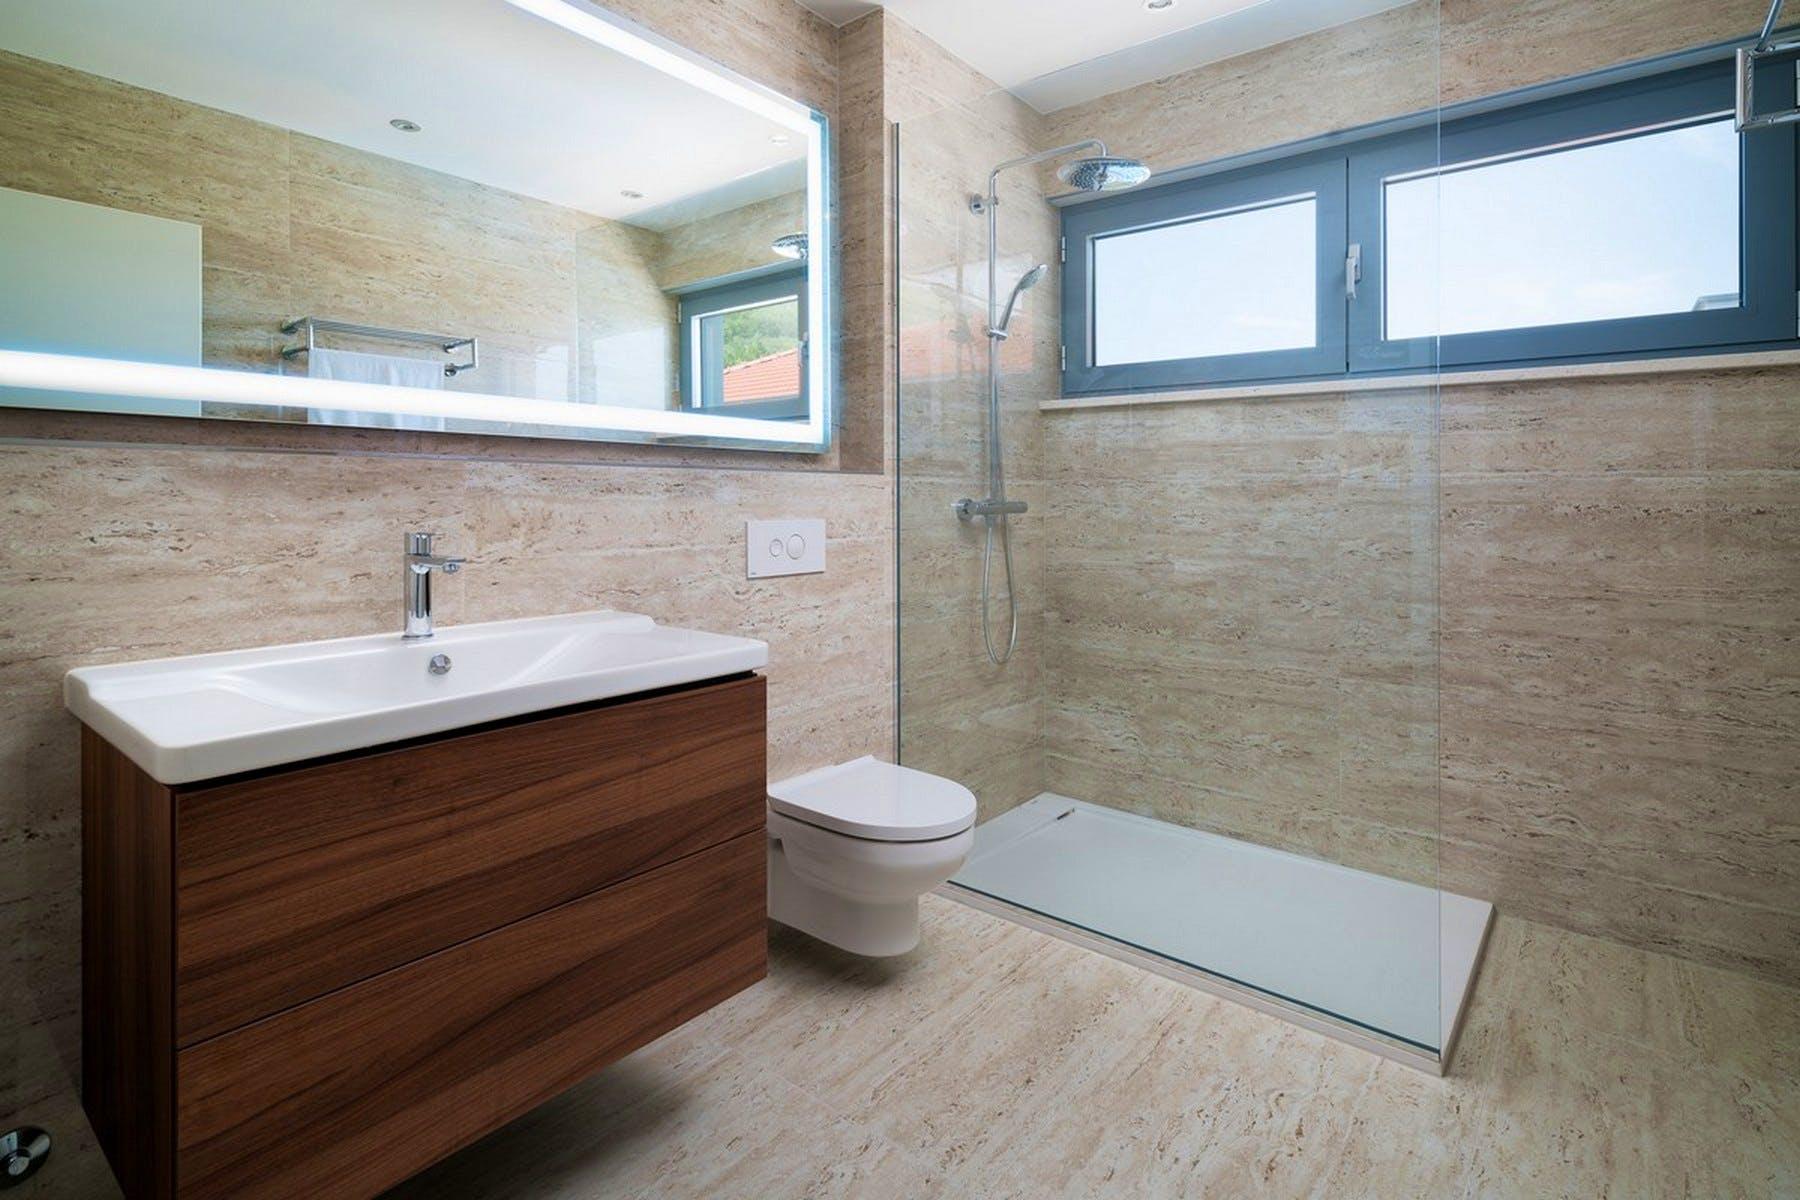 Modernly designed bathroom